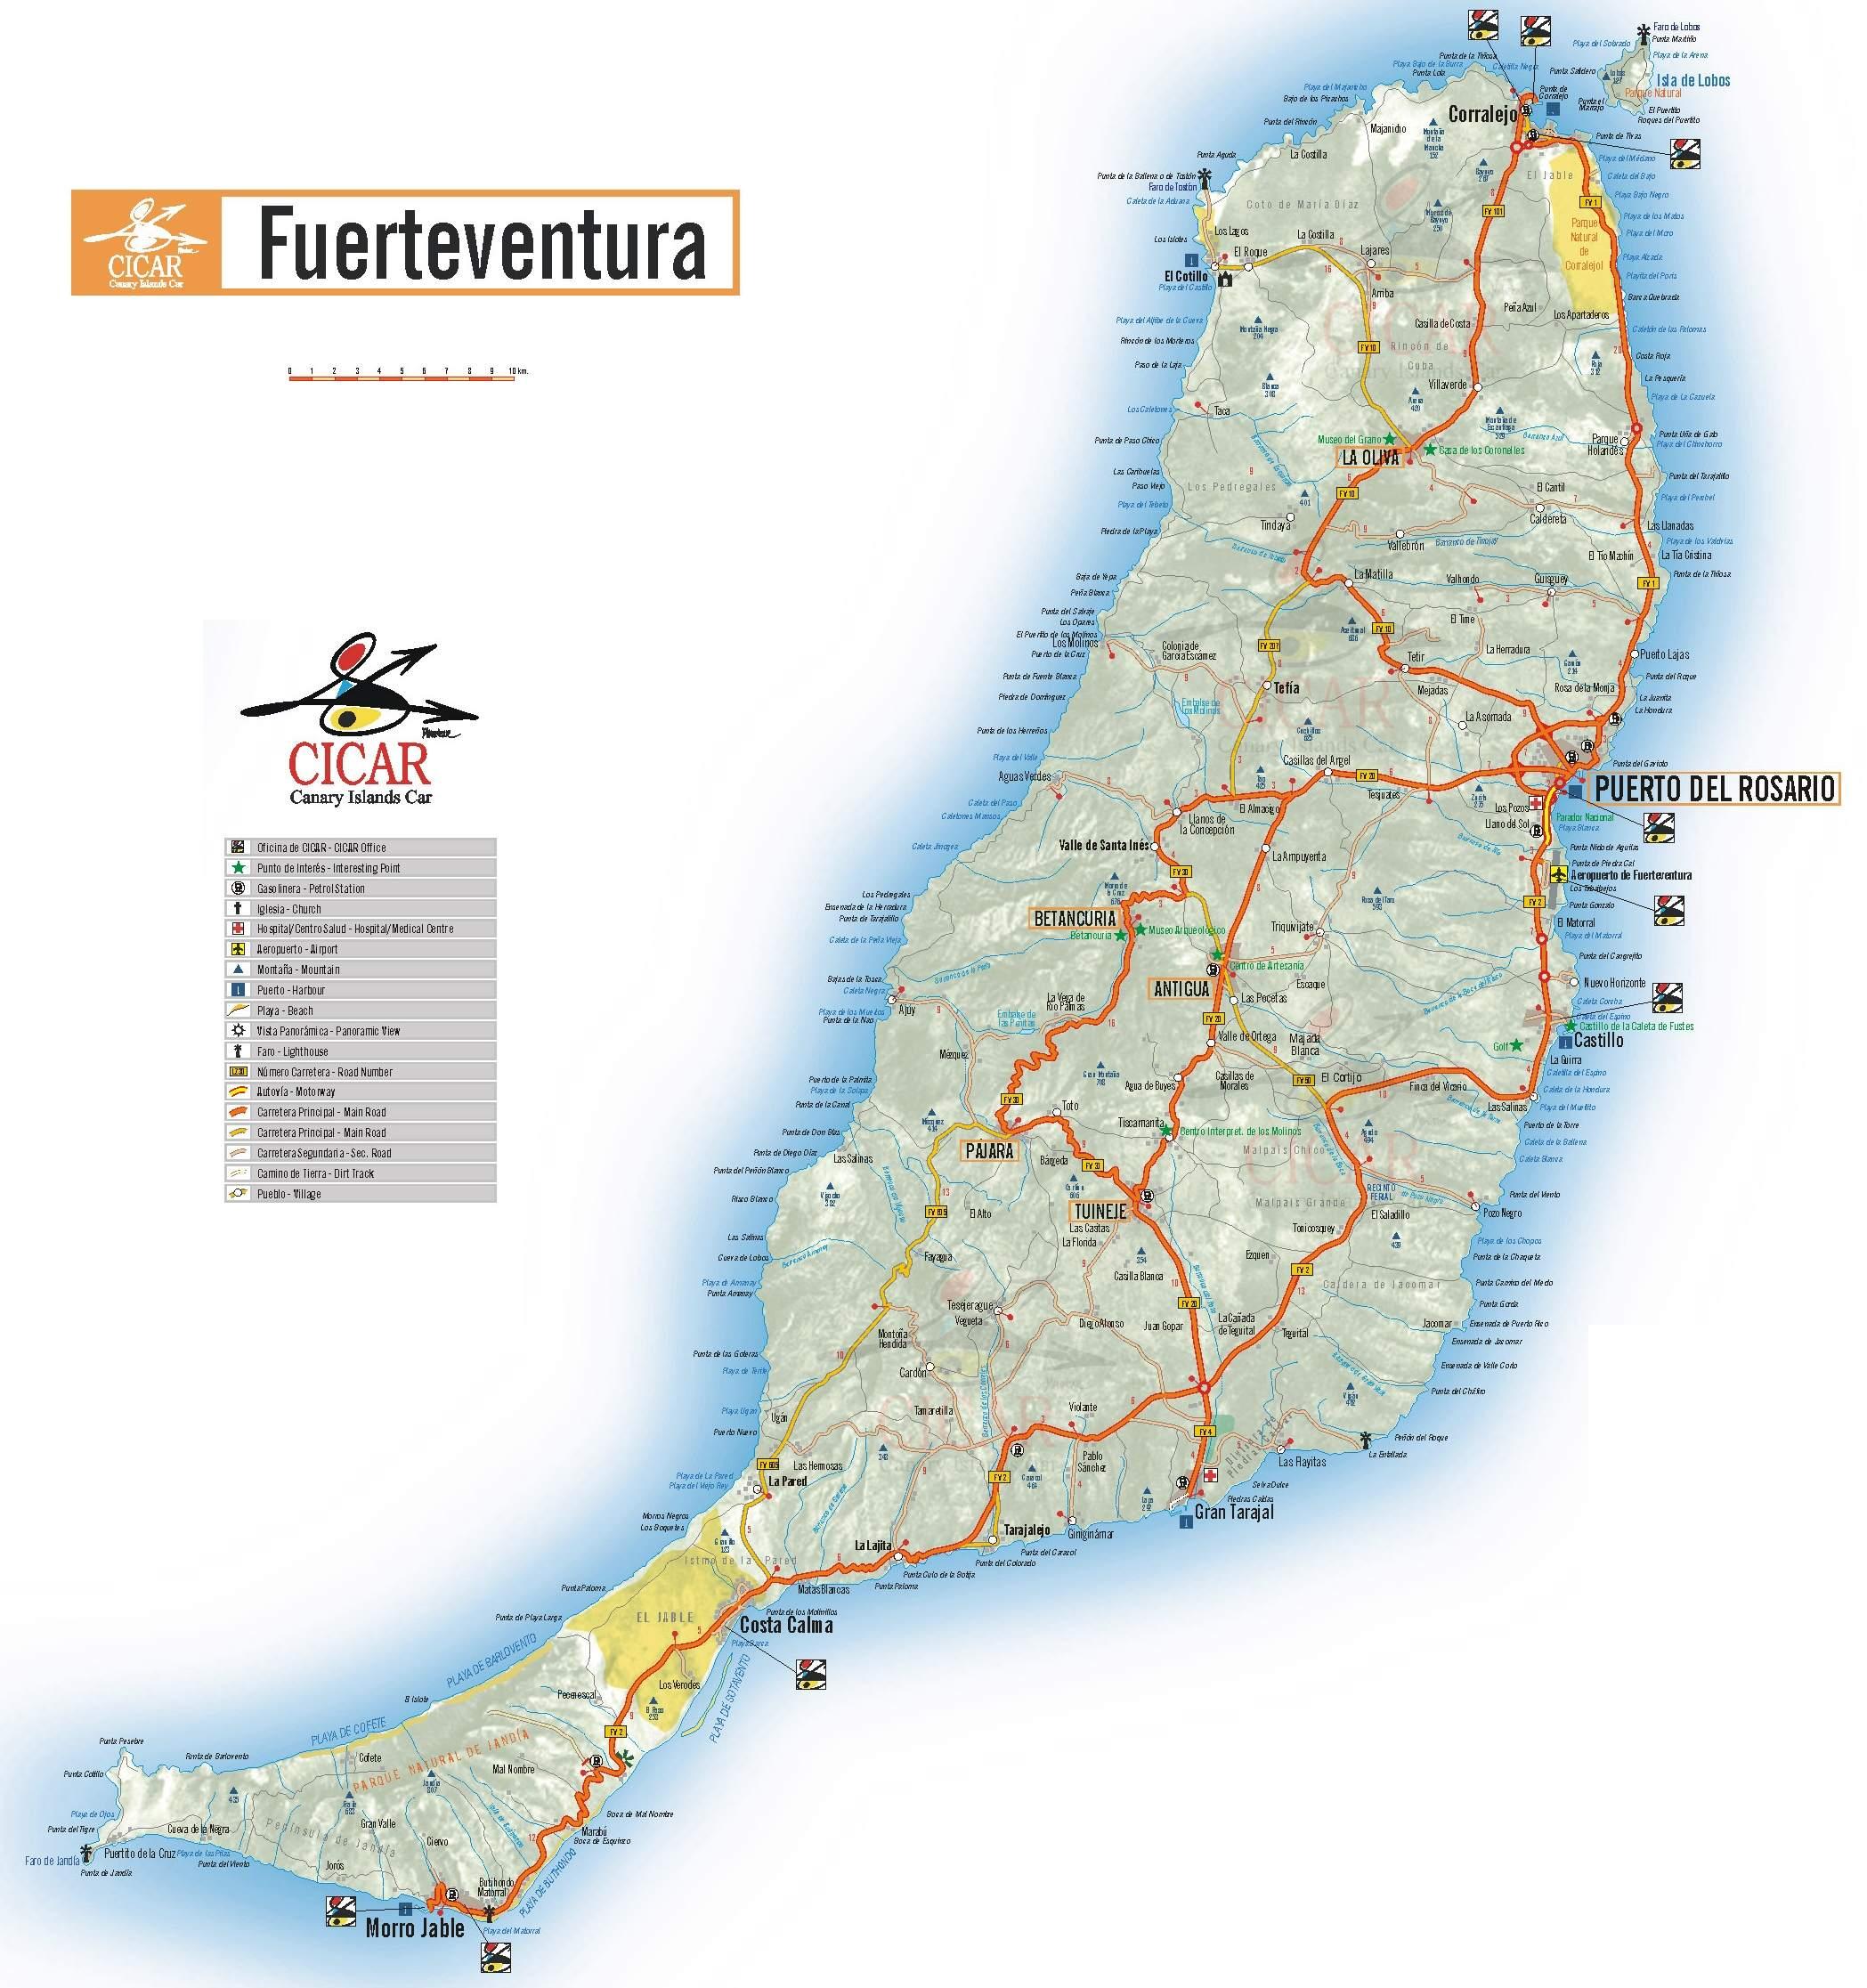 karte fuerteventura Karte Fuerteventura   grosse Fuerteventura Karte karte fuerteventura